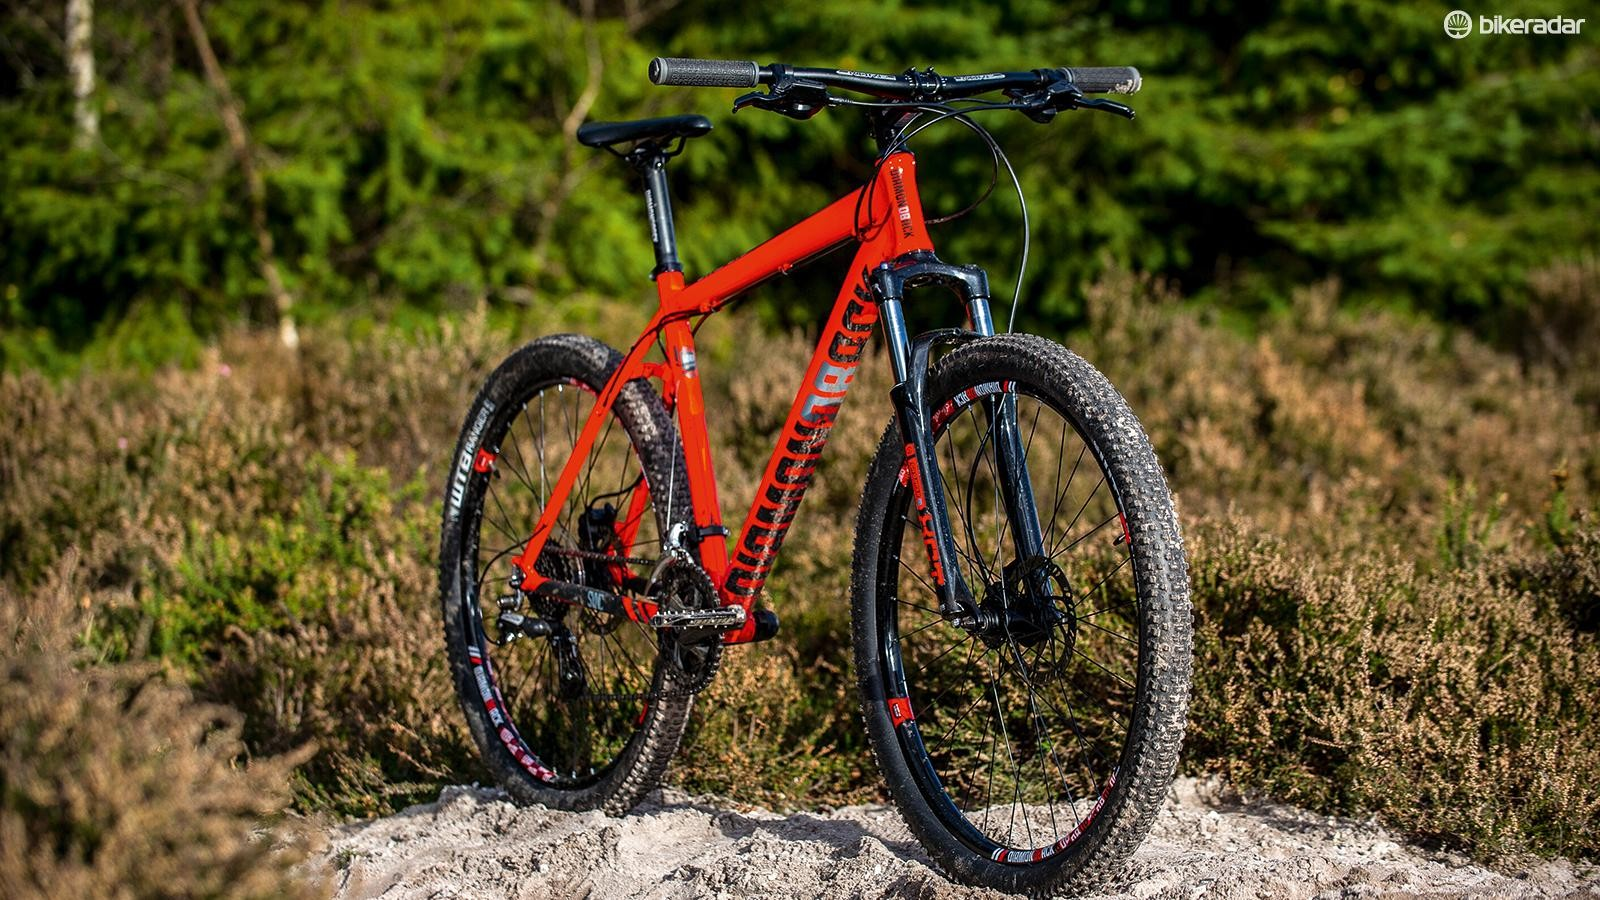 Diamondback Sync 3 0 review - BikeRadar